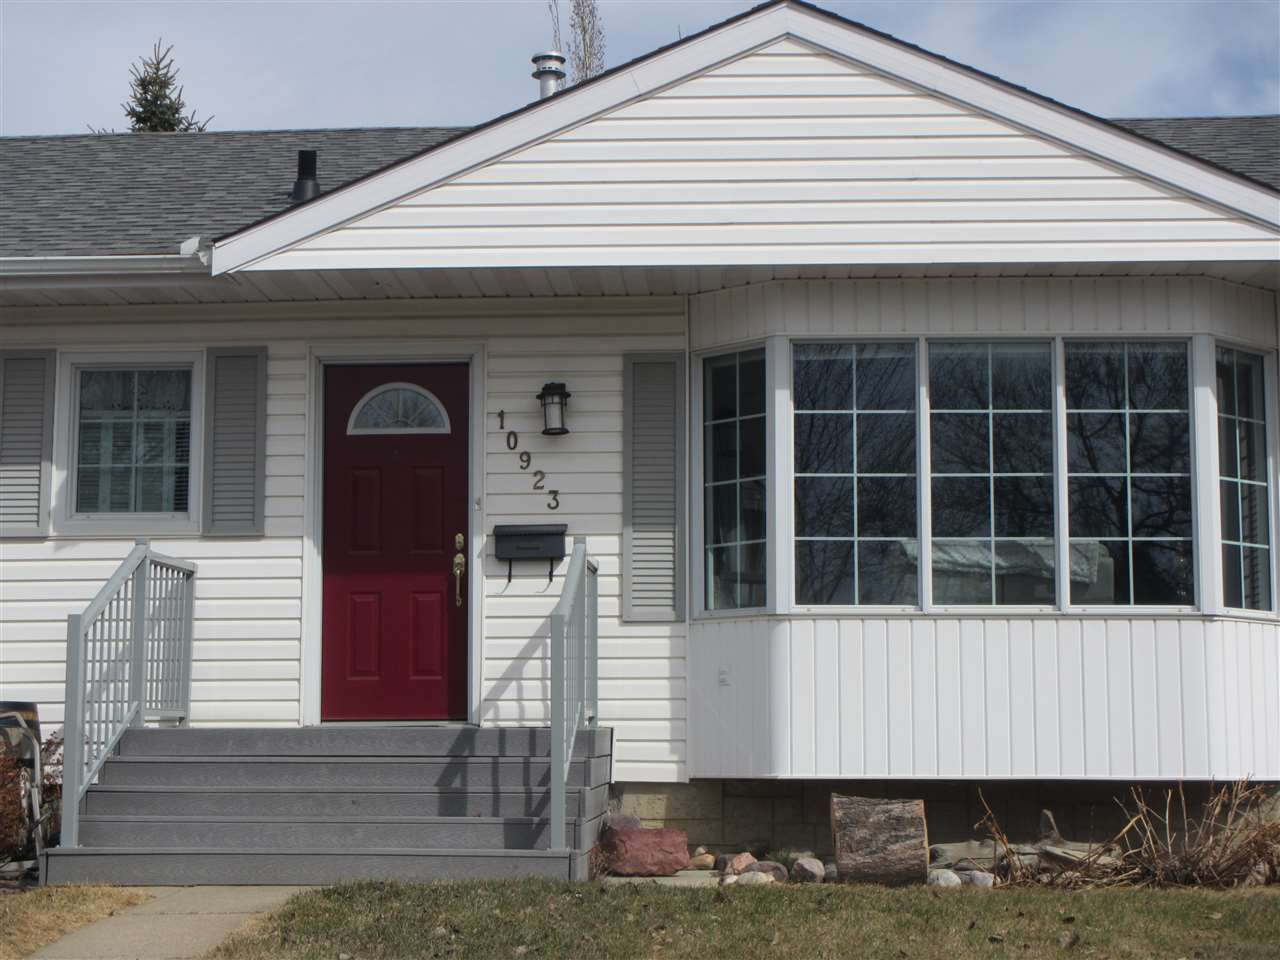 Main Photo: 10923 146 Street in Edmonton: Zone 21 House for sale : MLS®# E4106966